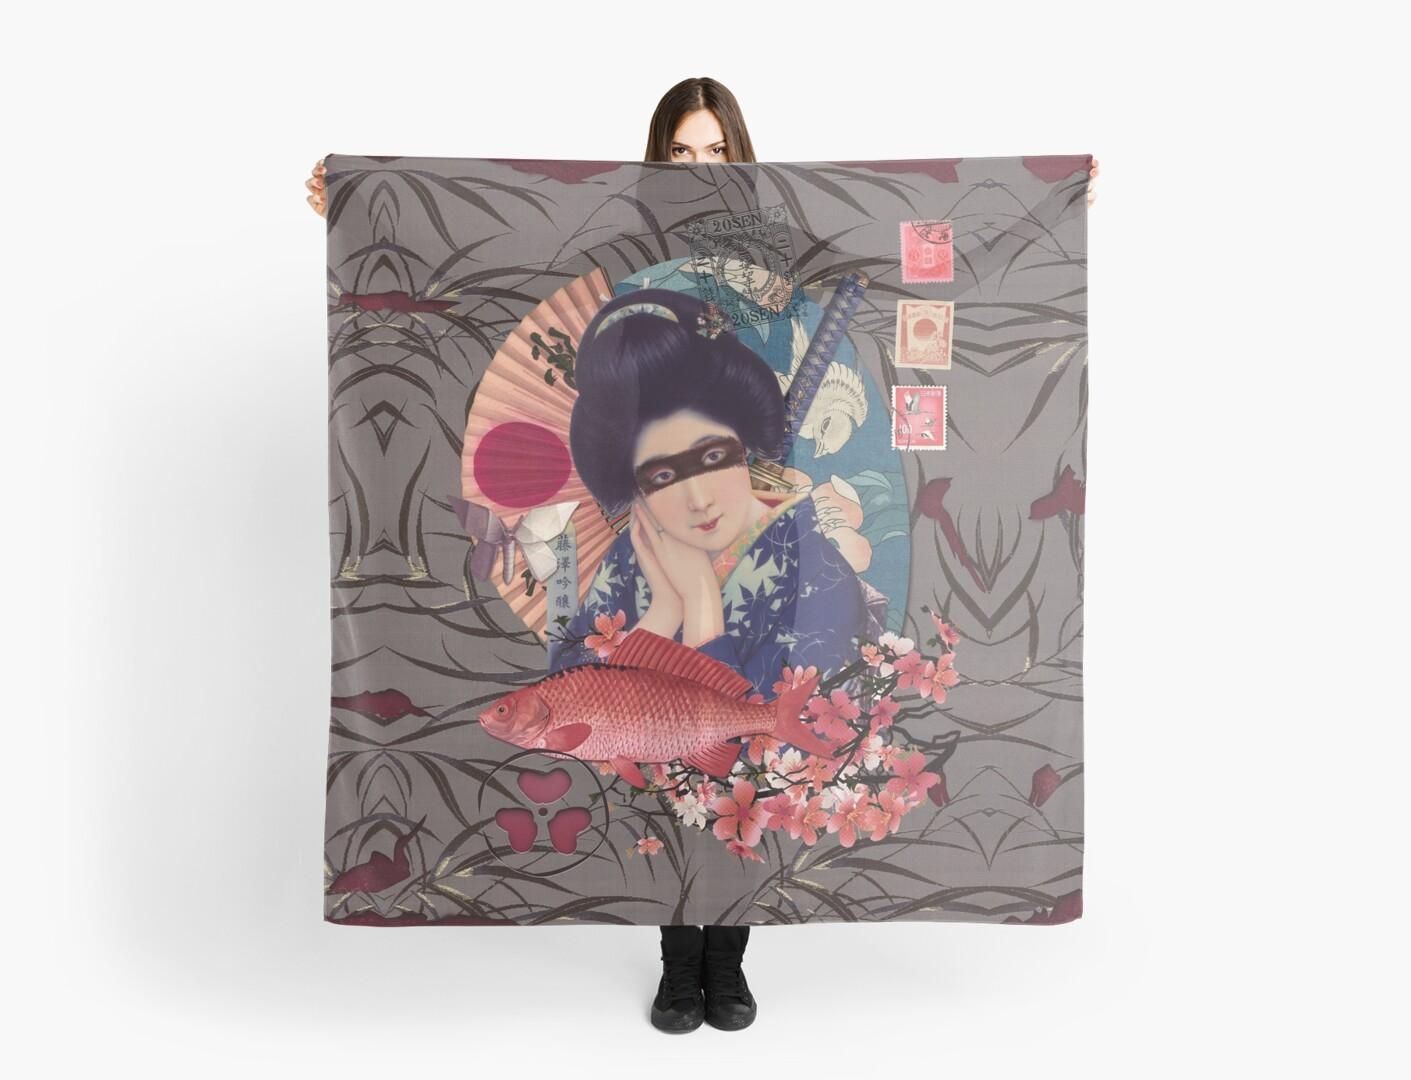 Collage Geisha Samurai in Coral, Indigo and Marsala by Eva Nev